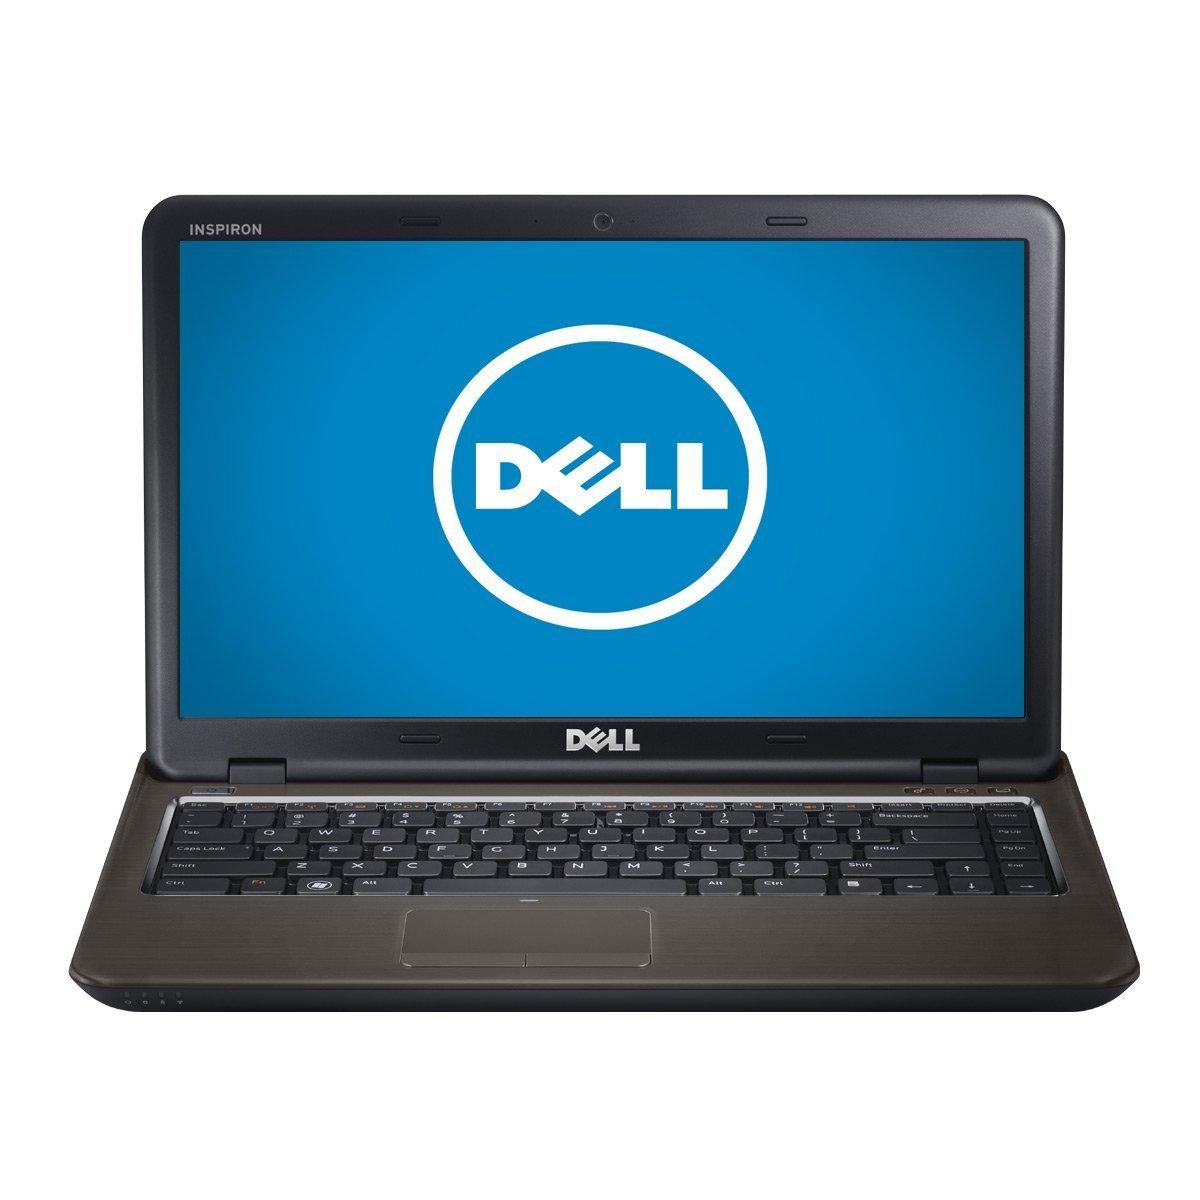 http://thetechjournal.com/wp-content/uploads/images/1204/1333304418-dell-inspiron-i14z2877bk-14inch-laptop-1.jpg